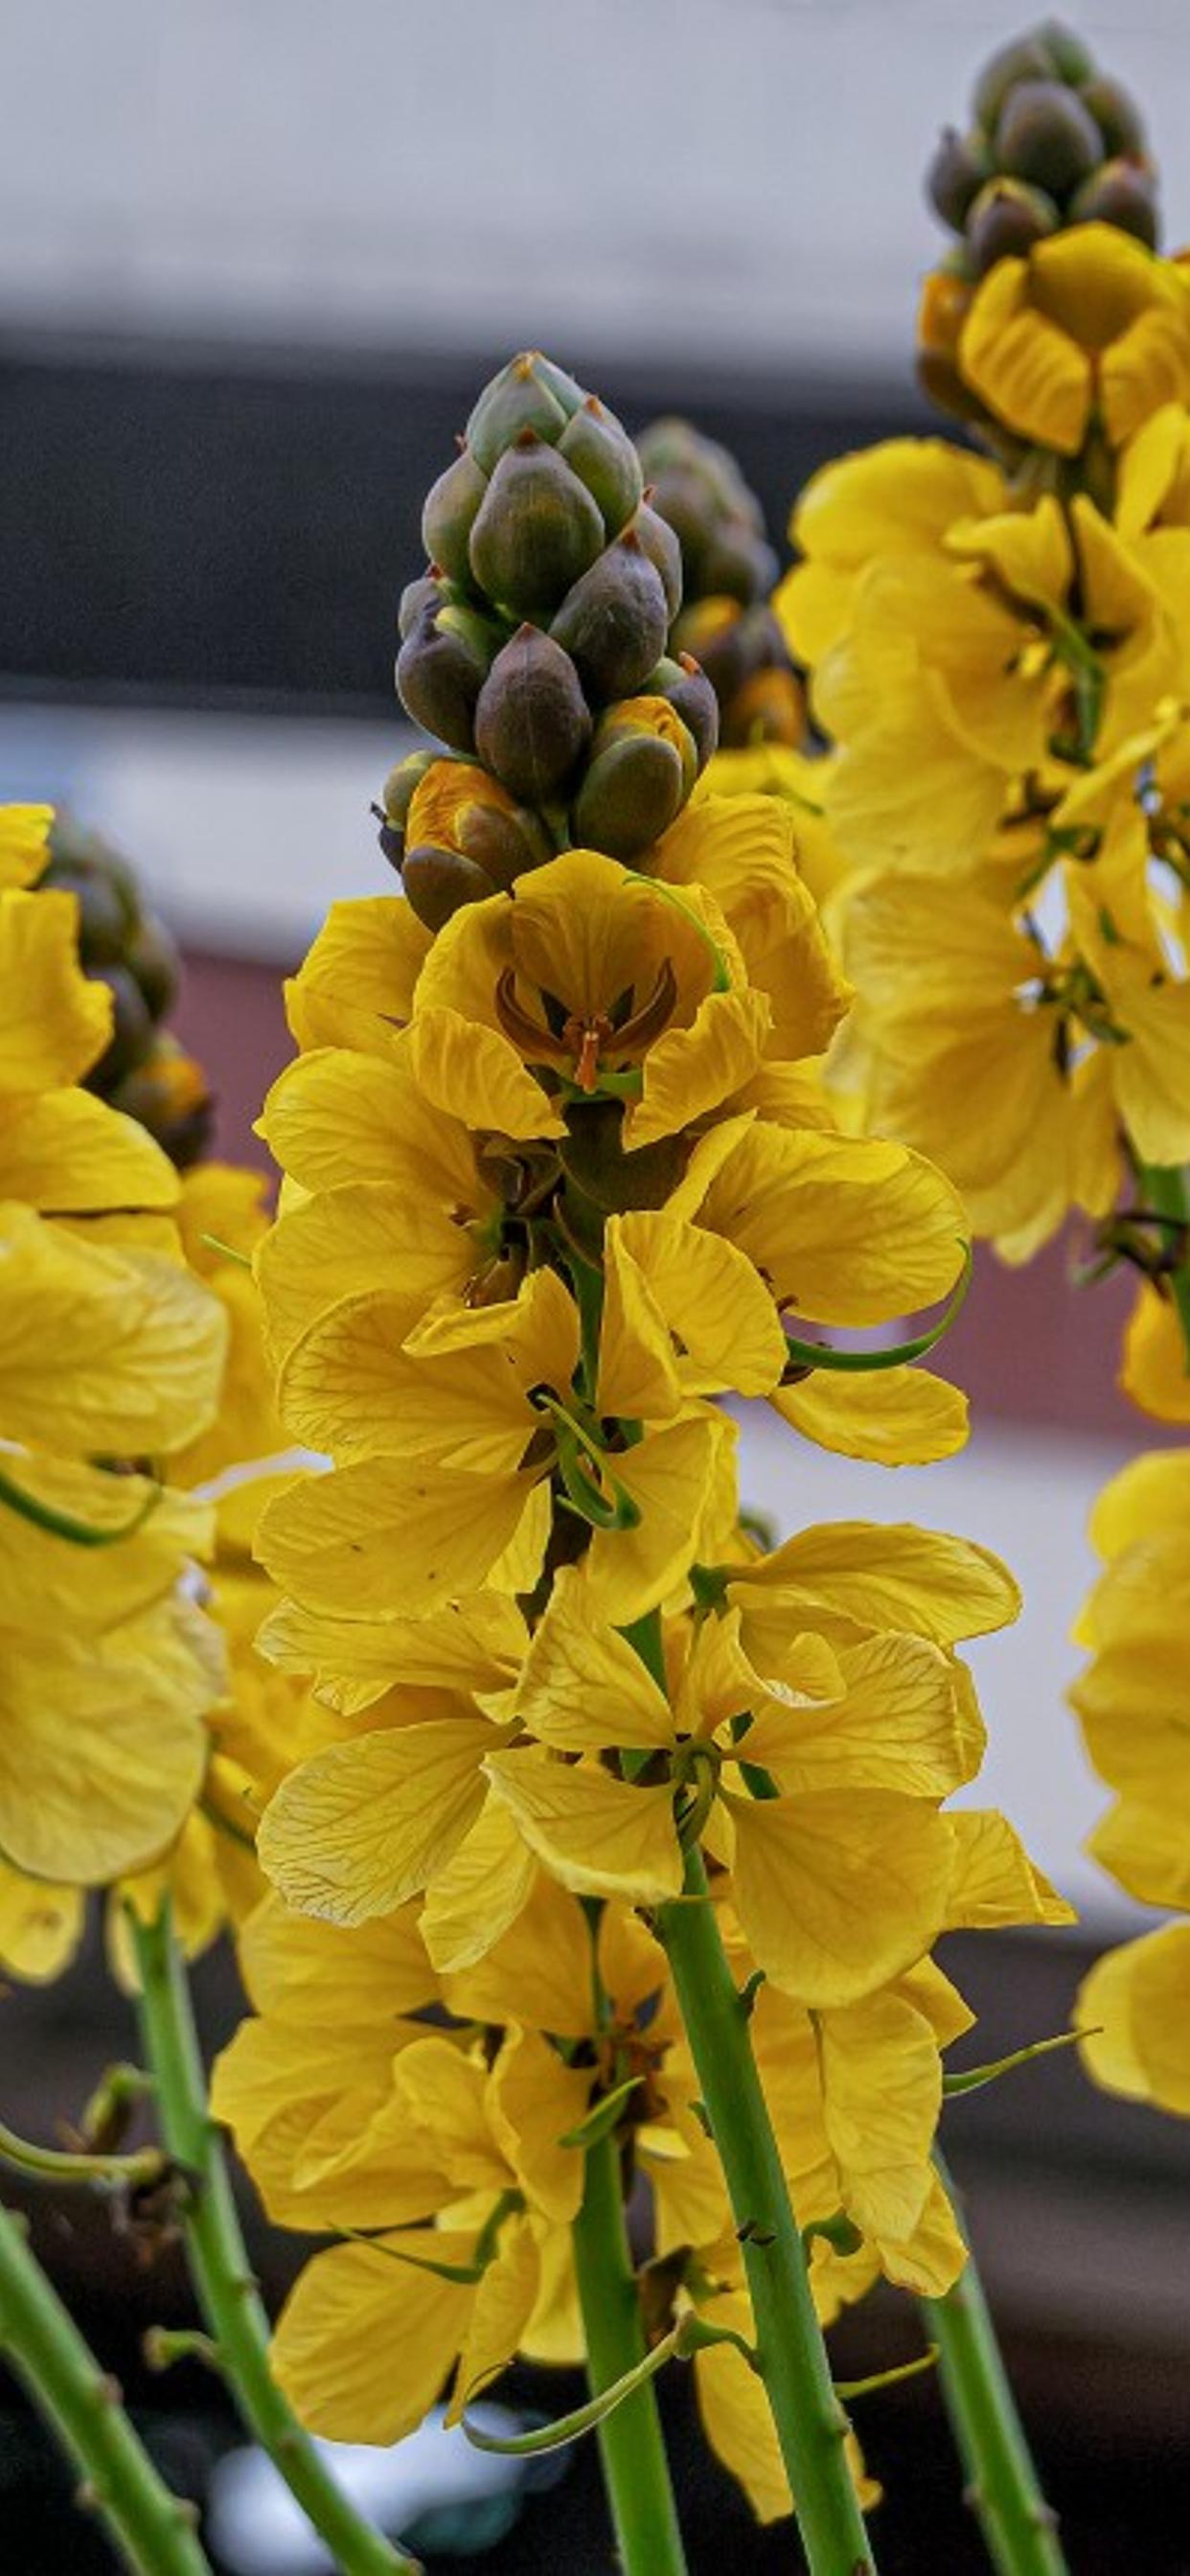 Yellow Flower In The Garden Hd Wallpaper